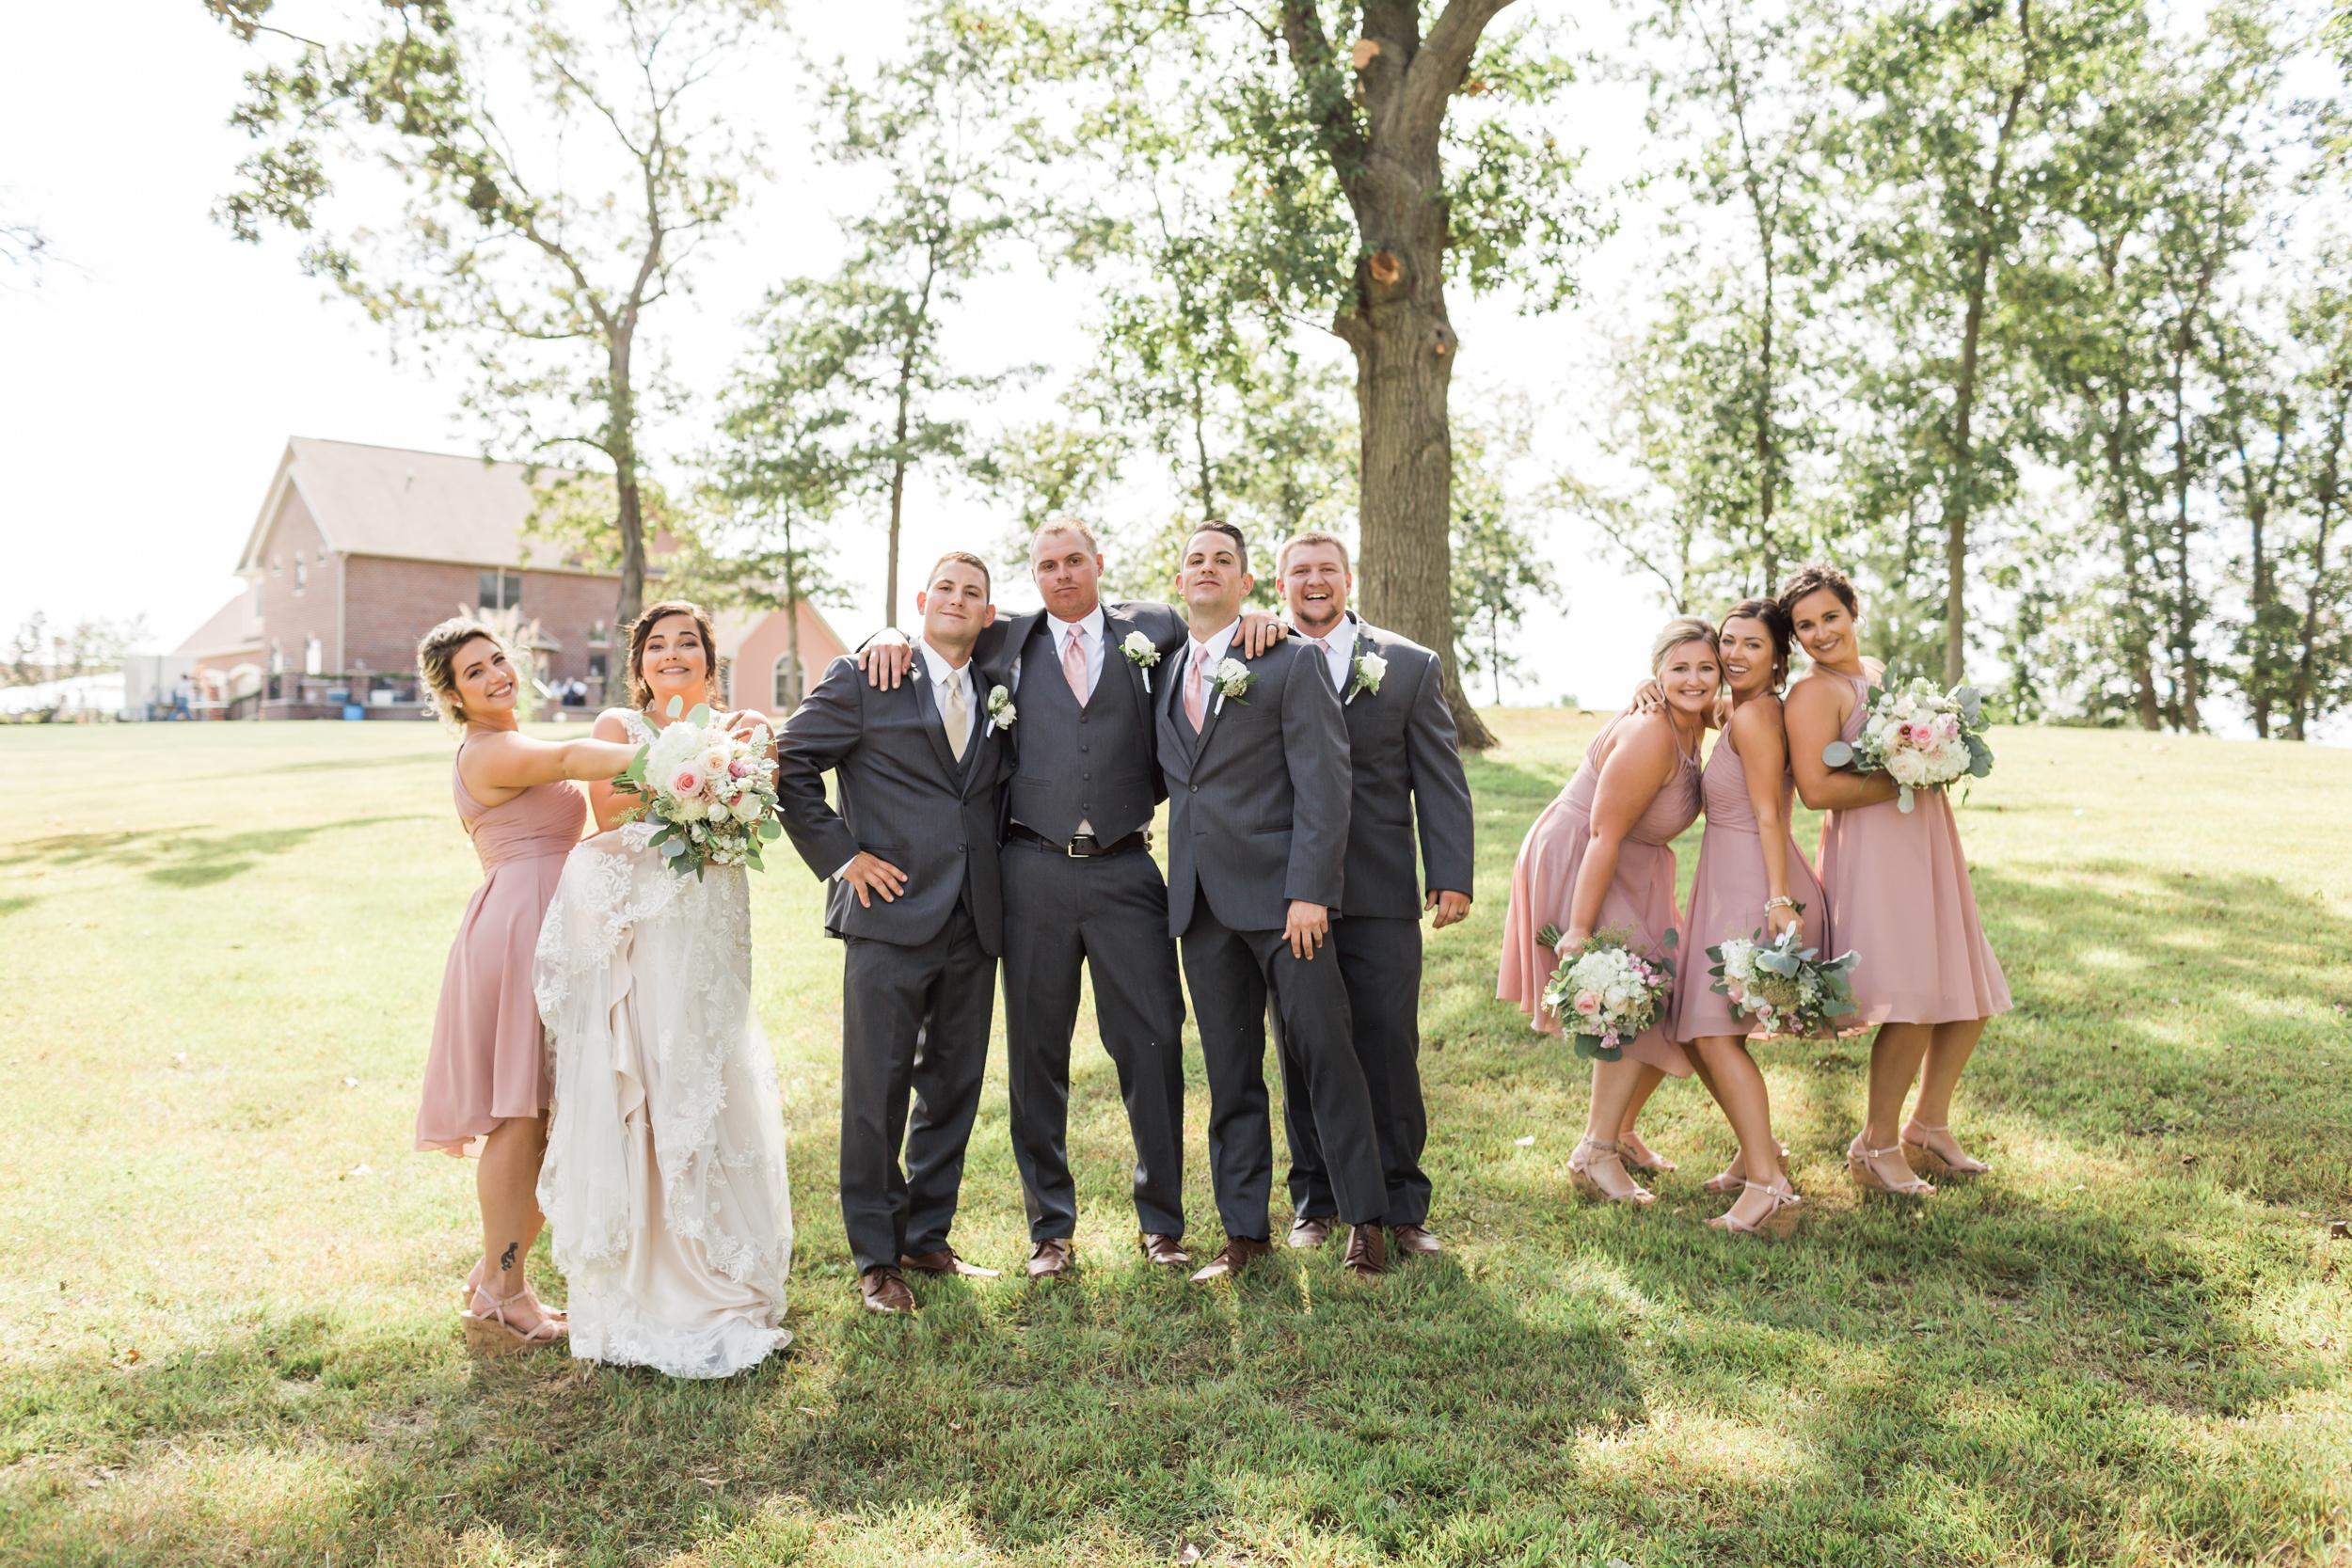 romanticcountrywedding--46.jpg